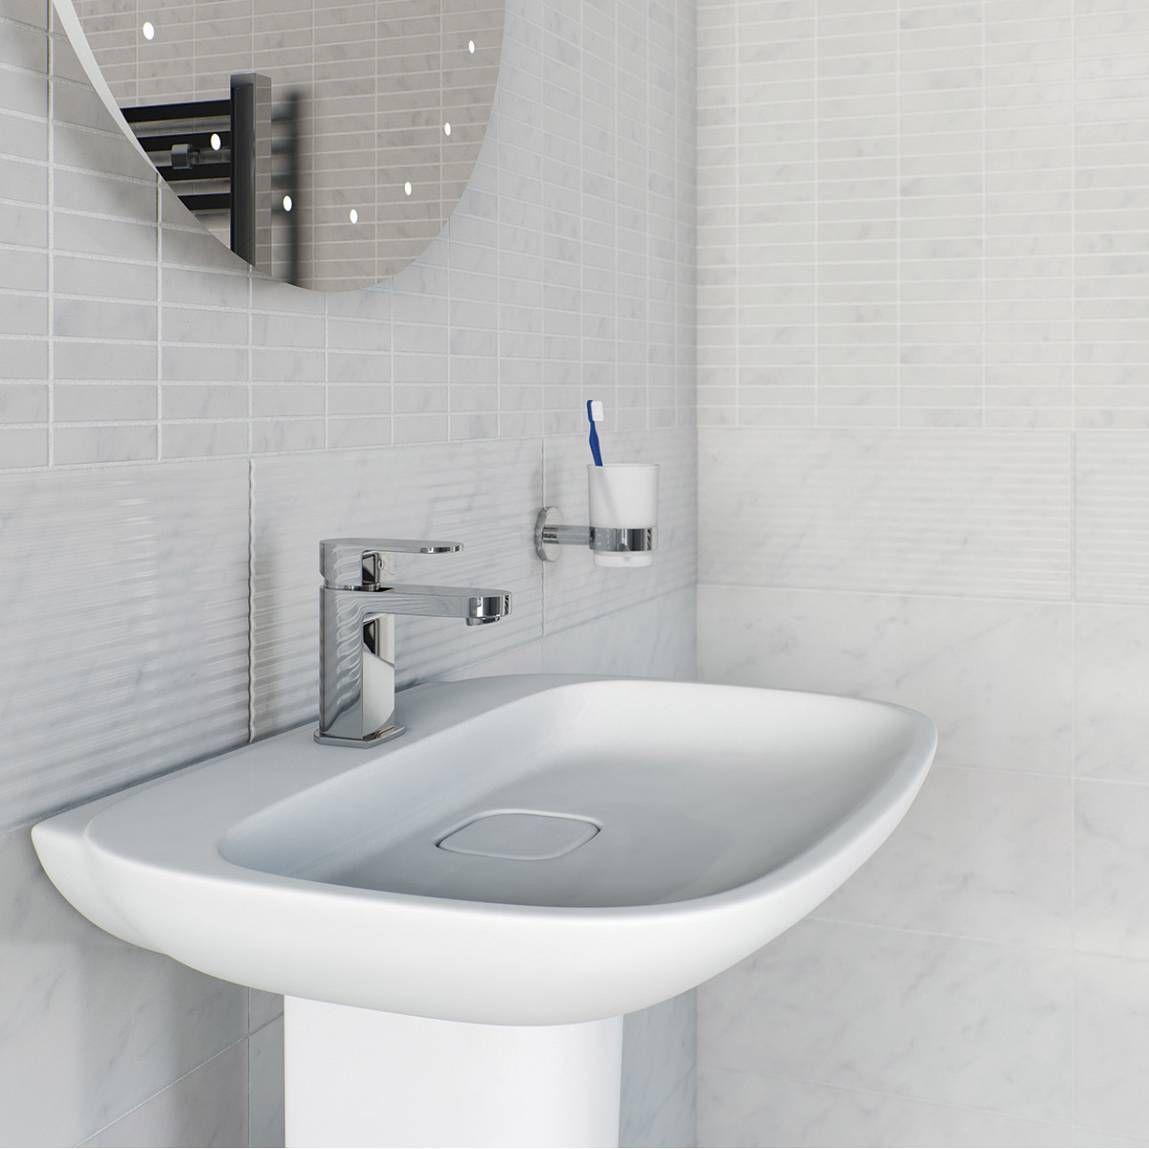 Carina ripple texture ceramic wall tile 20cm x 50cm ideas for carina ripple texture ceramic wall tile 20cm x 50cm dailygadgetfo Gallery